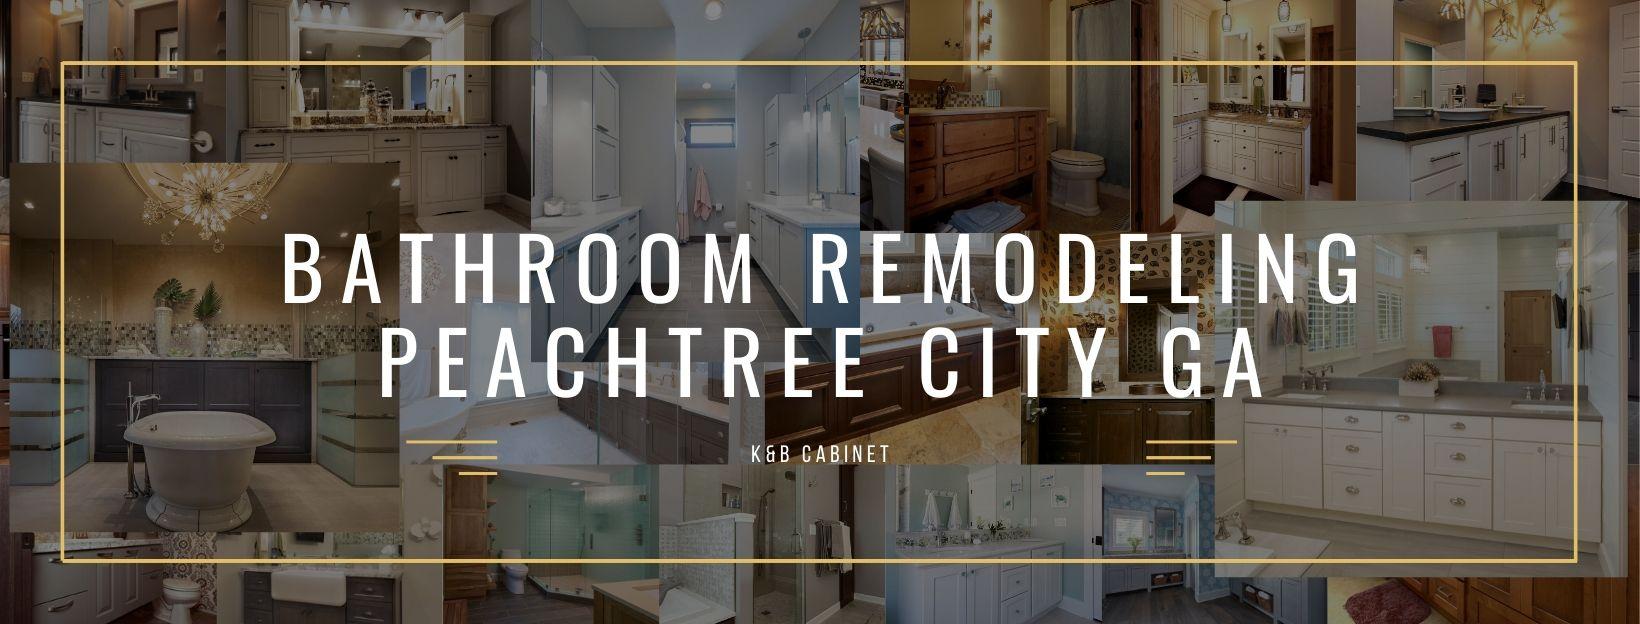 Bathroom Remodeling Peachtree City GA